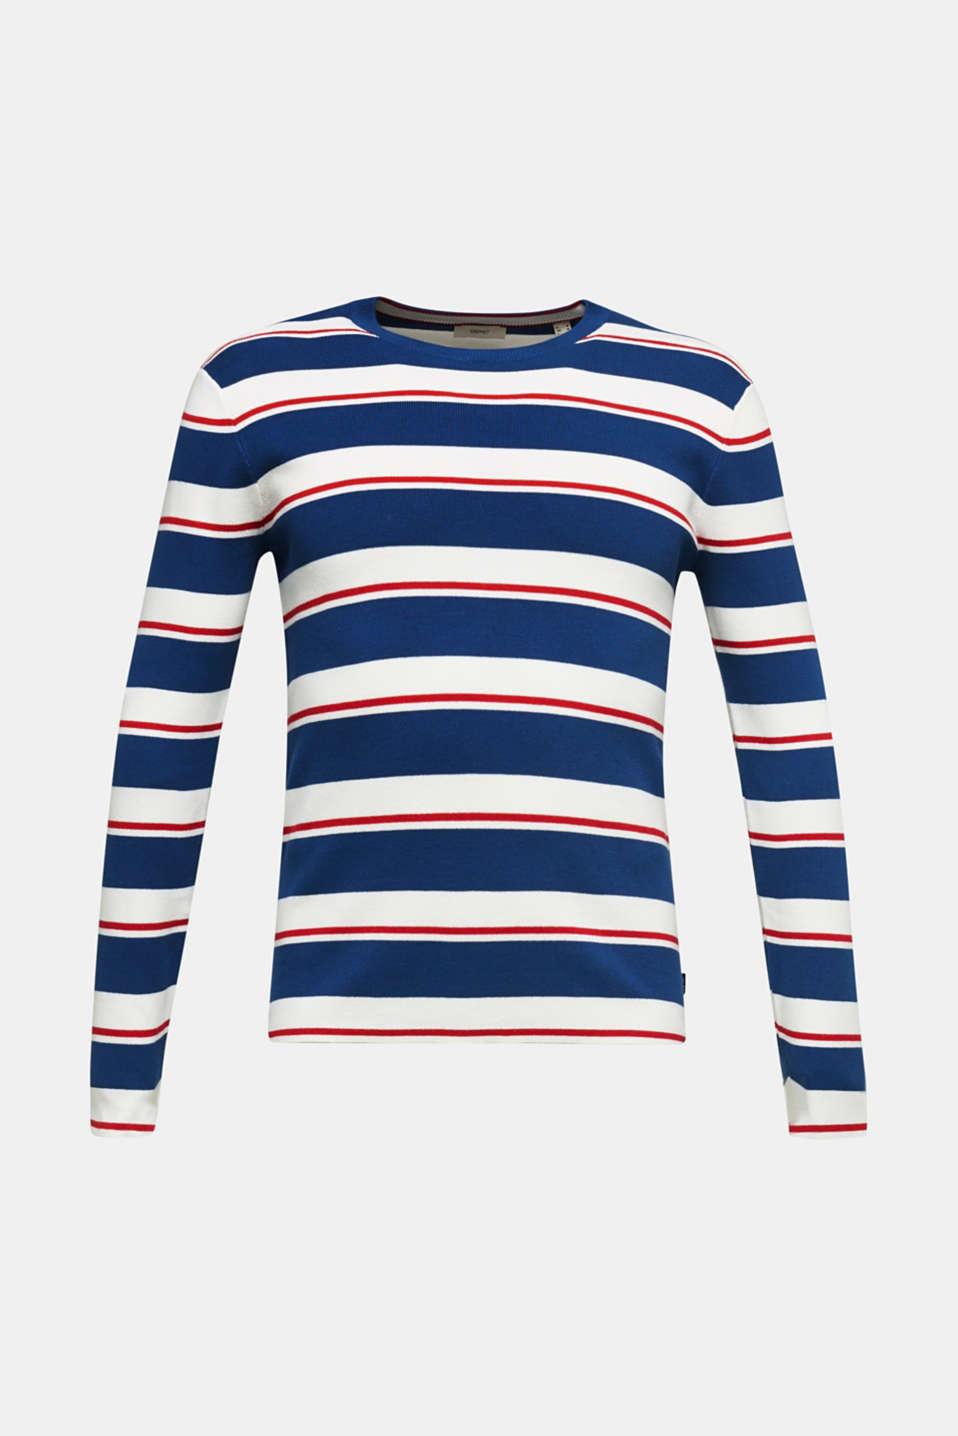 Striped sweatshirt in 100% cotton, BLUE 3, detail image number 6